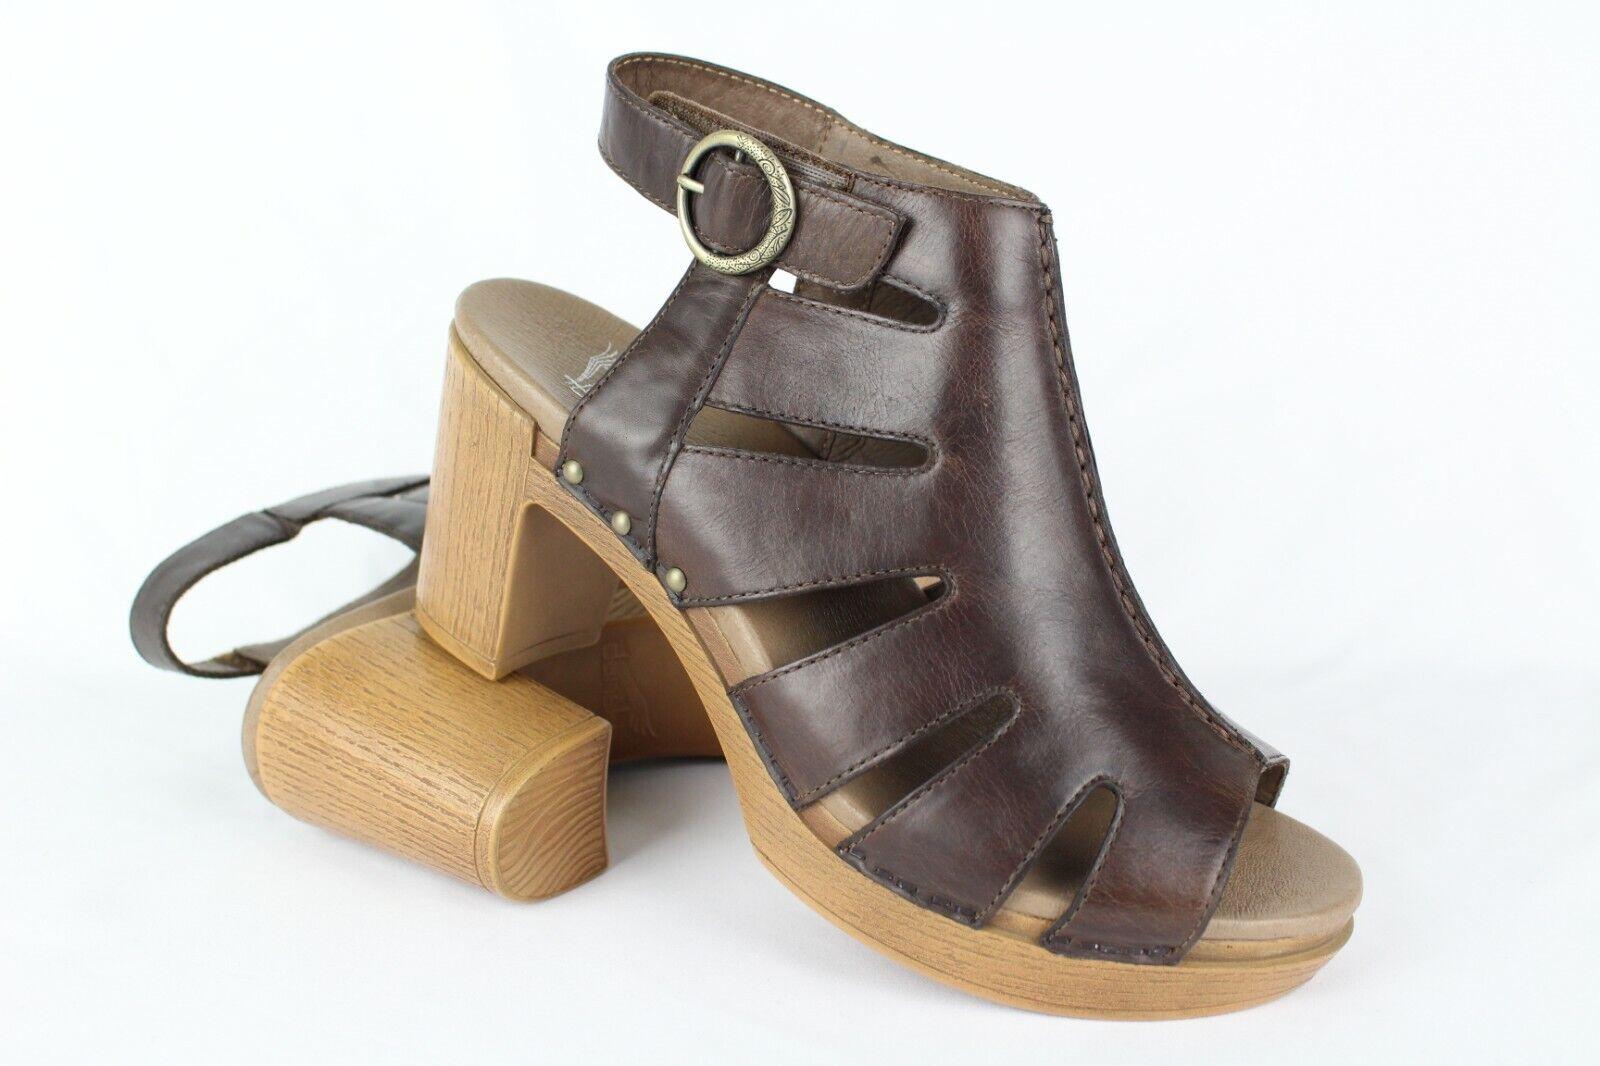 Dansko Donna  Demetra Heeled Sandals Dimensione 41 10.5-11 10.5-11 10.5-11 Taupe 3104671400 dfbd85